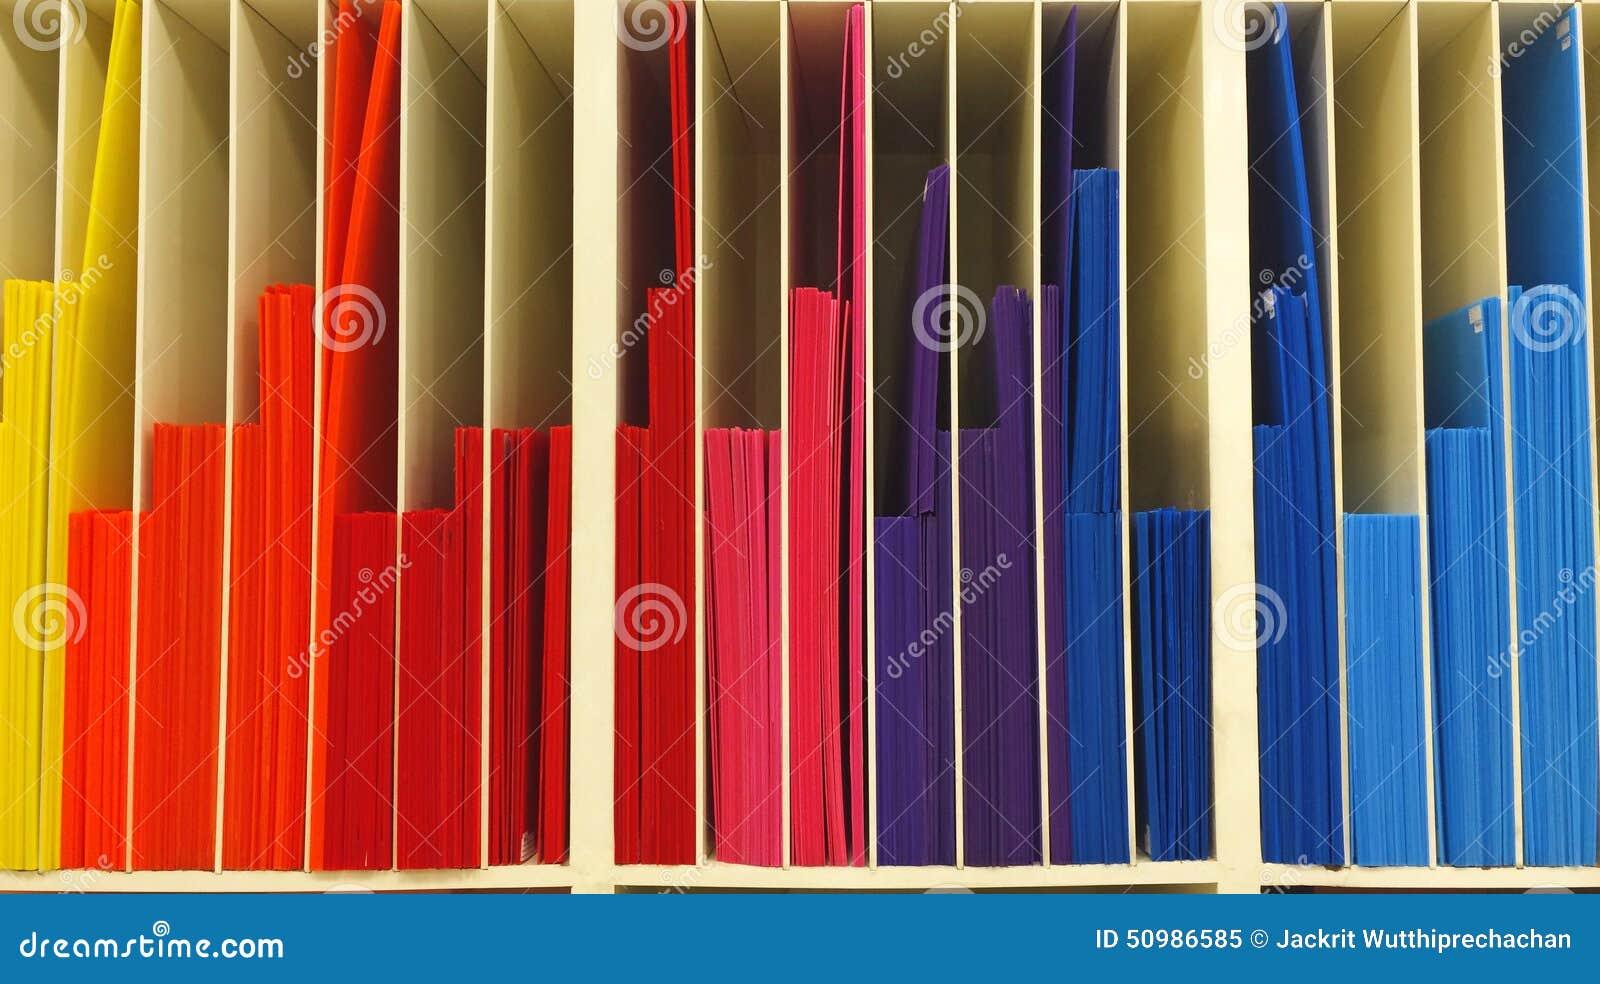 stack of multi color corrugated plastic order as graph. Black Bedroom Furniture Sets. Home Design Ideas